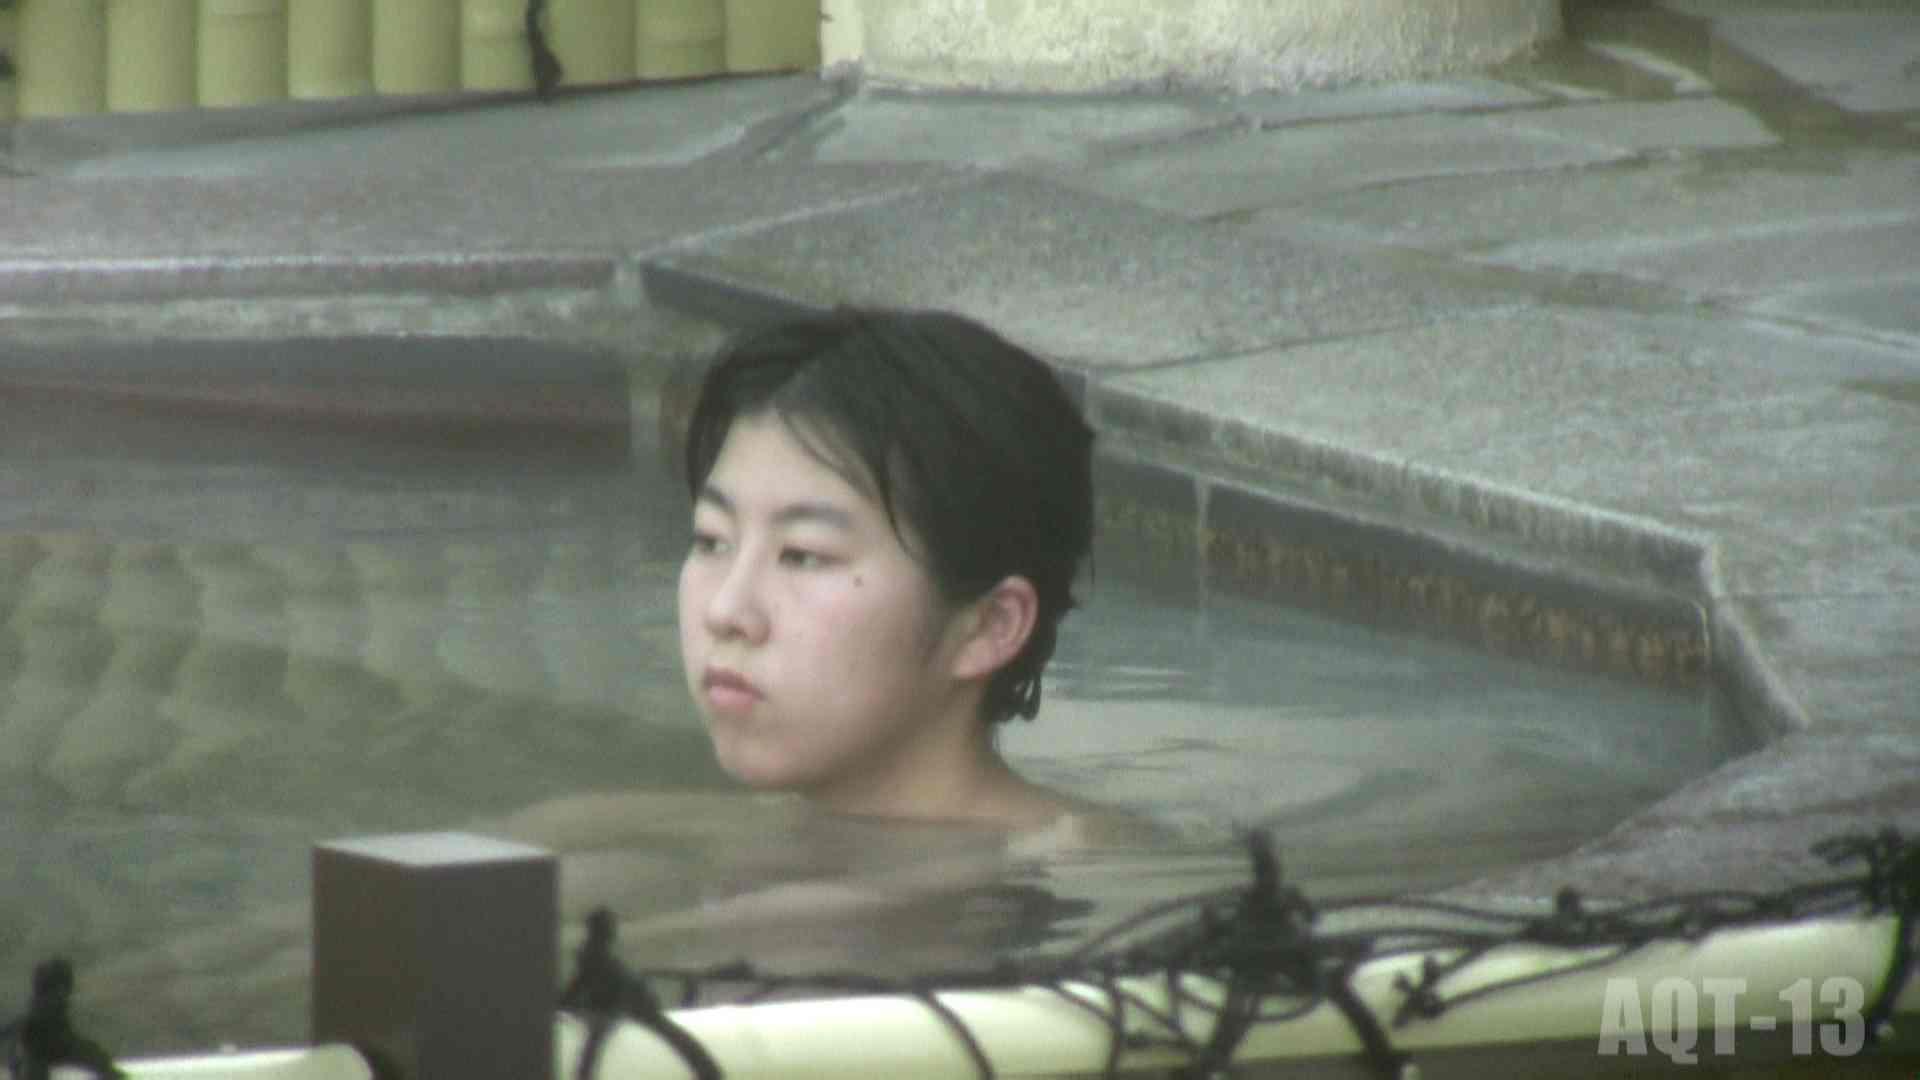 Aquaな露天風呂Vol.816 OLのエロ生活 | 露天風呂  90連発 37